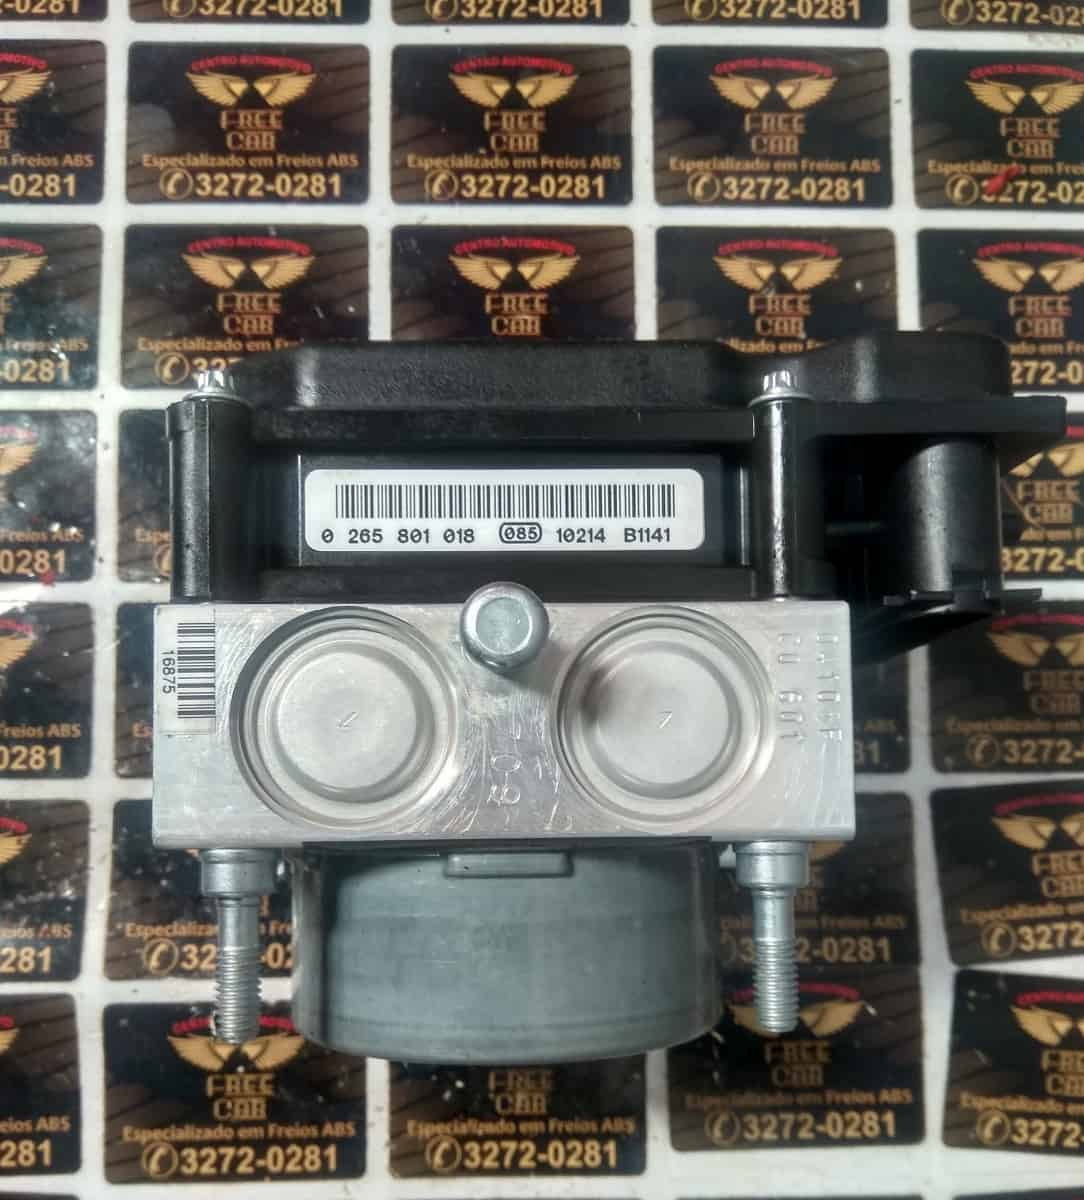 Modulo ABS Renault 0 265 801 018 / 0 265 232 718 - Foto 1